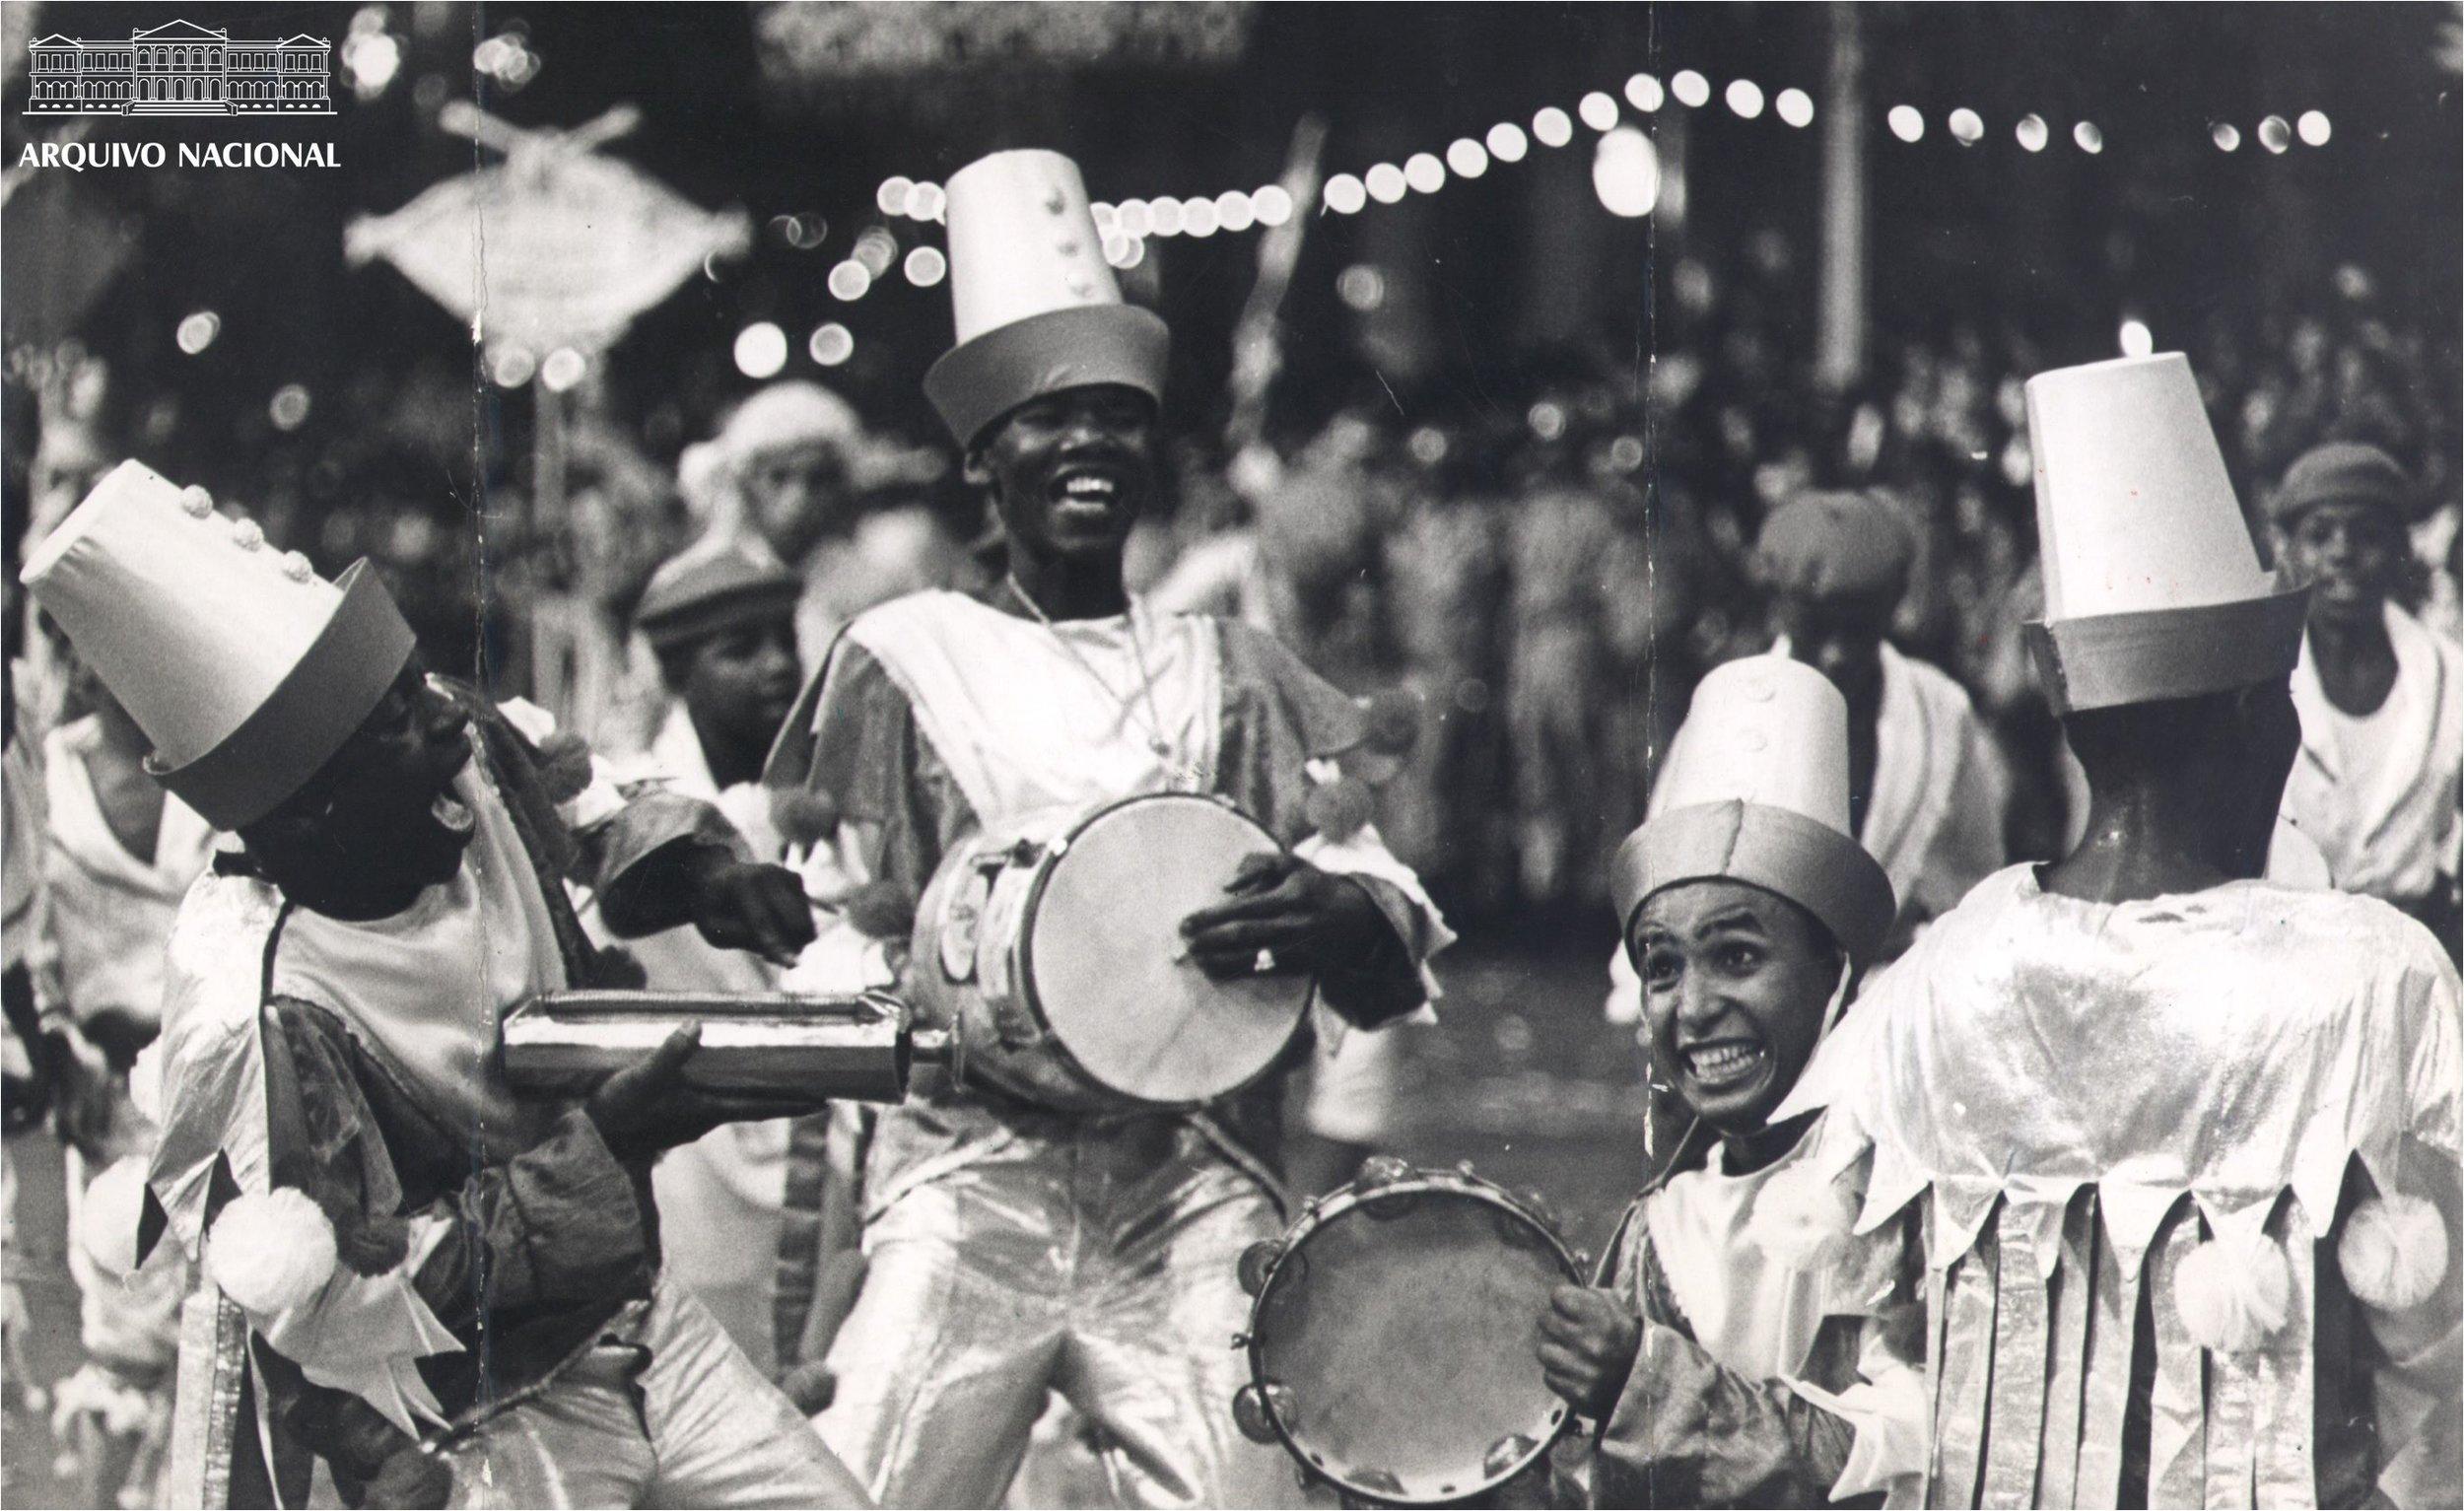 Carnival parade in 1965 (Photo: Brazilian National Archive)